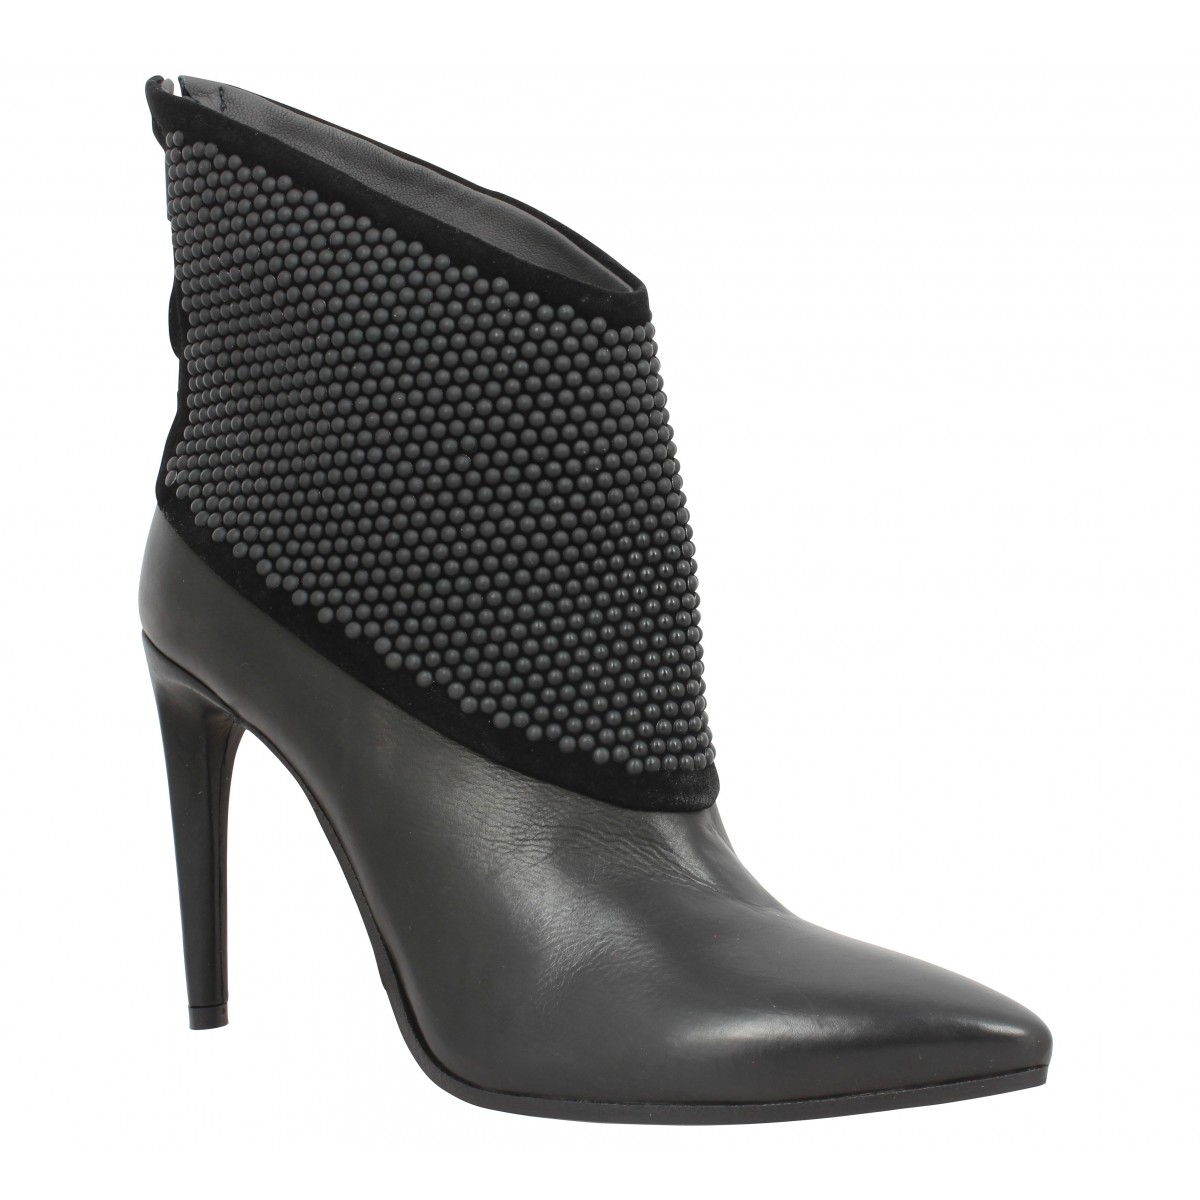 Bottines FRU.IT 5648 cuir Femme Noir